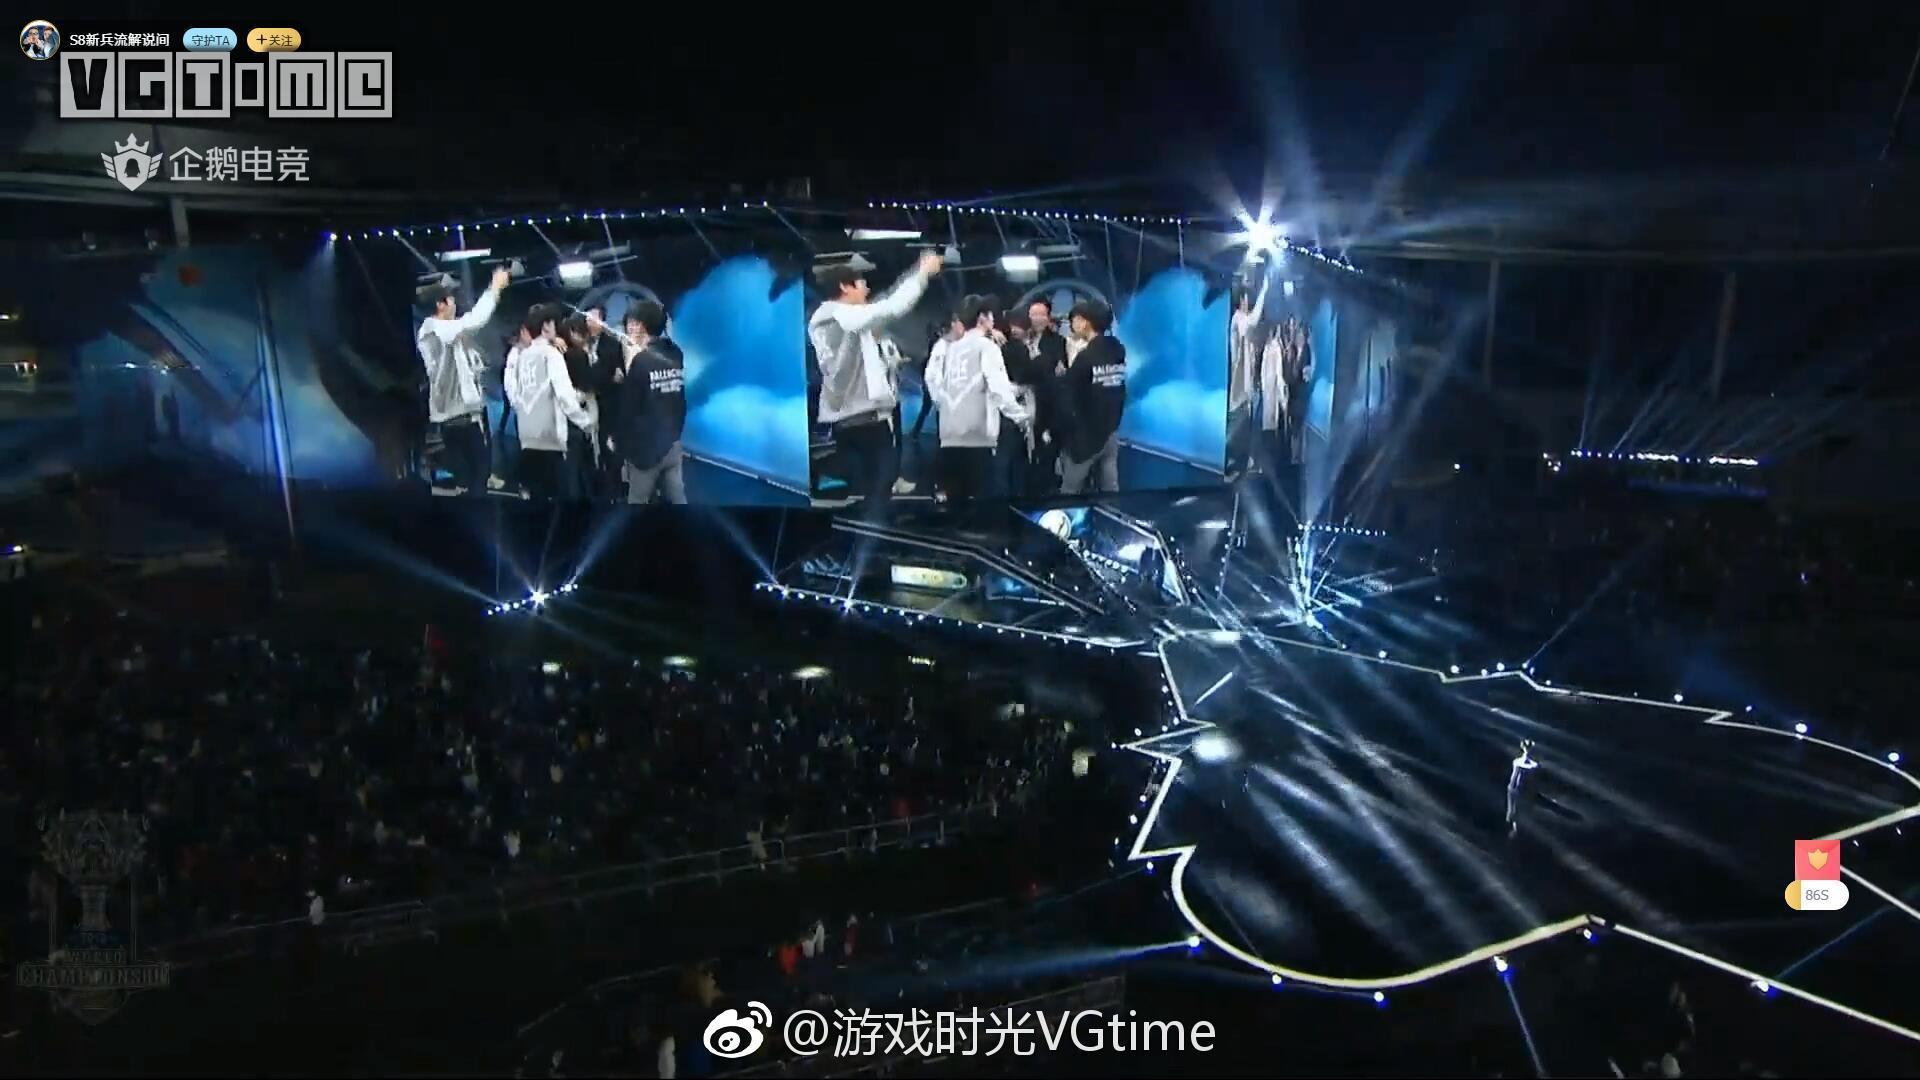 IG战队拿下《英雄联盟》S8全球总决赛冠军!!!